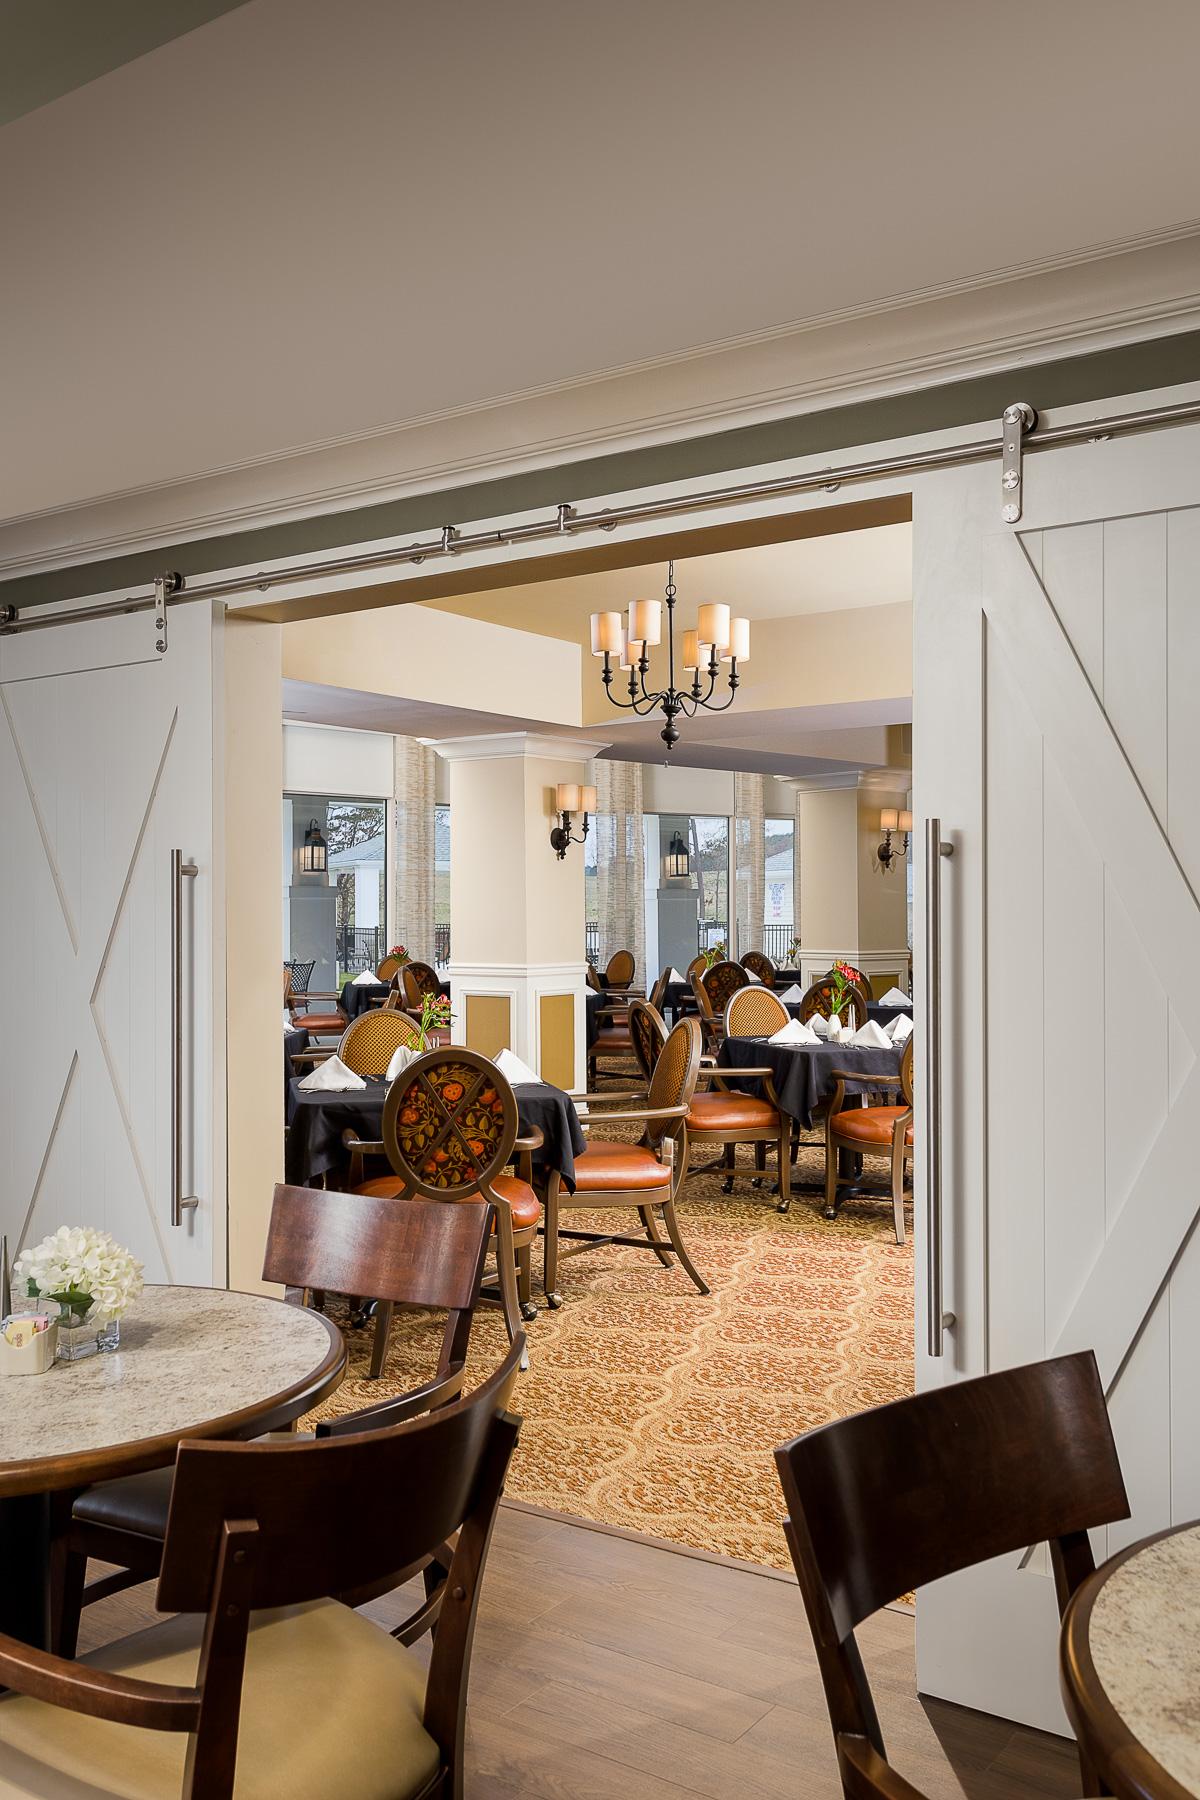 tellico-village-dining-hall-sliding-doors